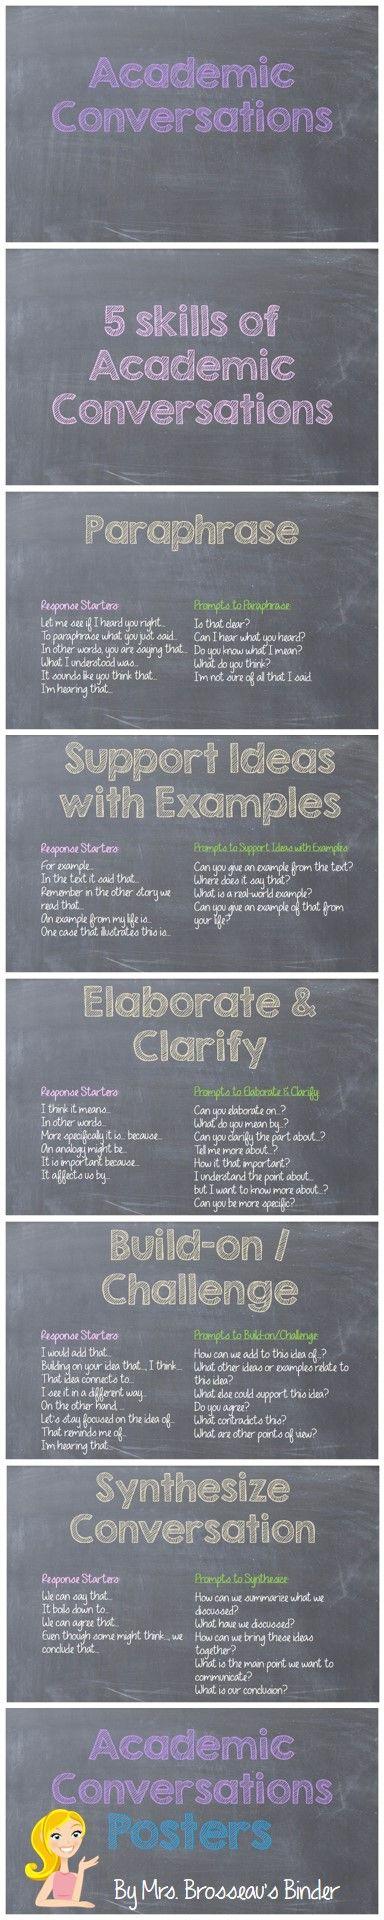 essay communication skills english